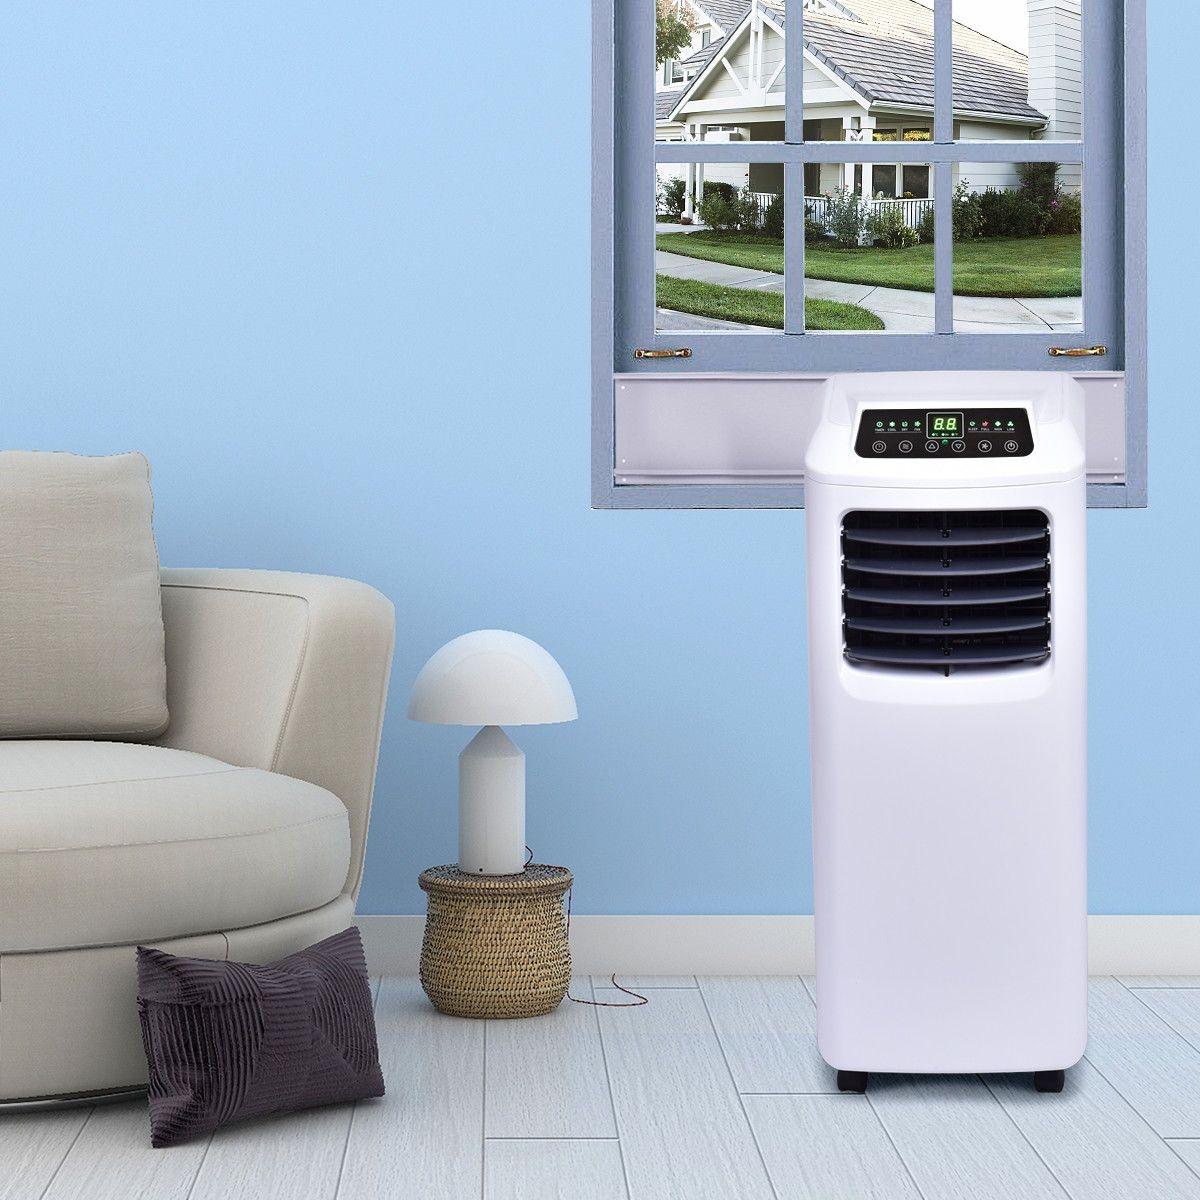 10000 BTU Portable Dehumidifier Air Conditioner with